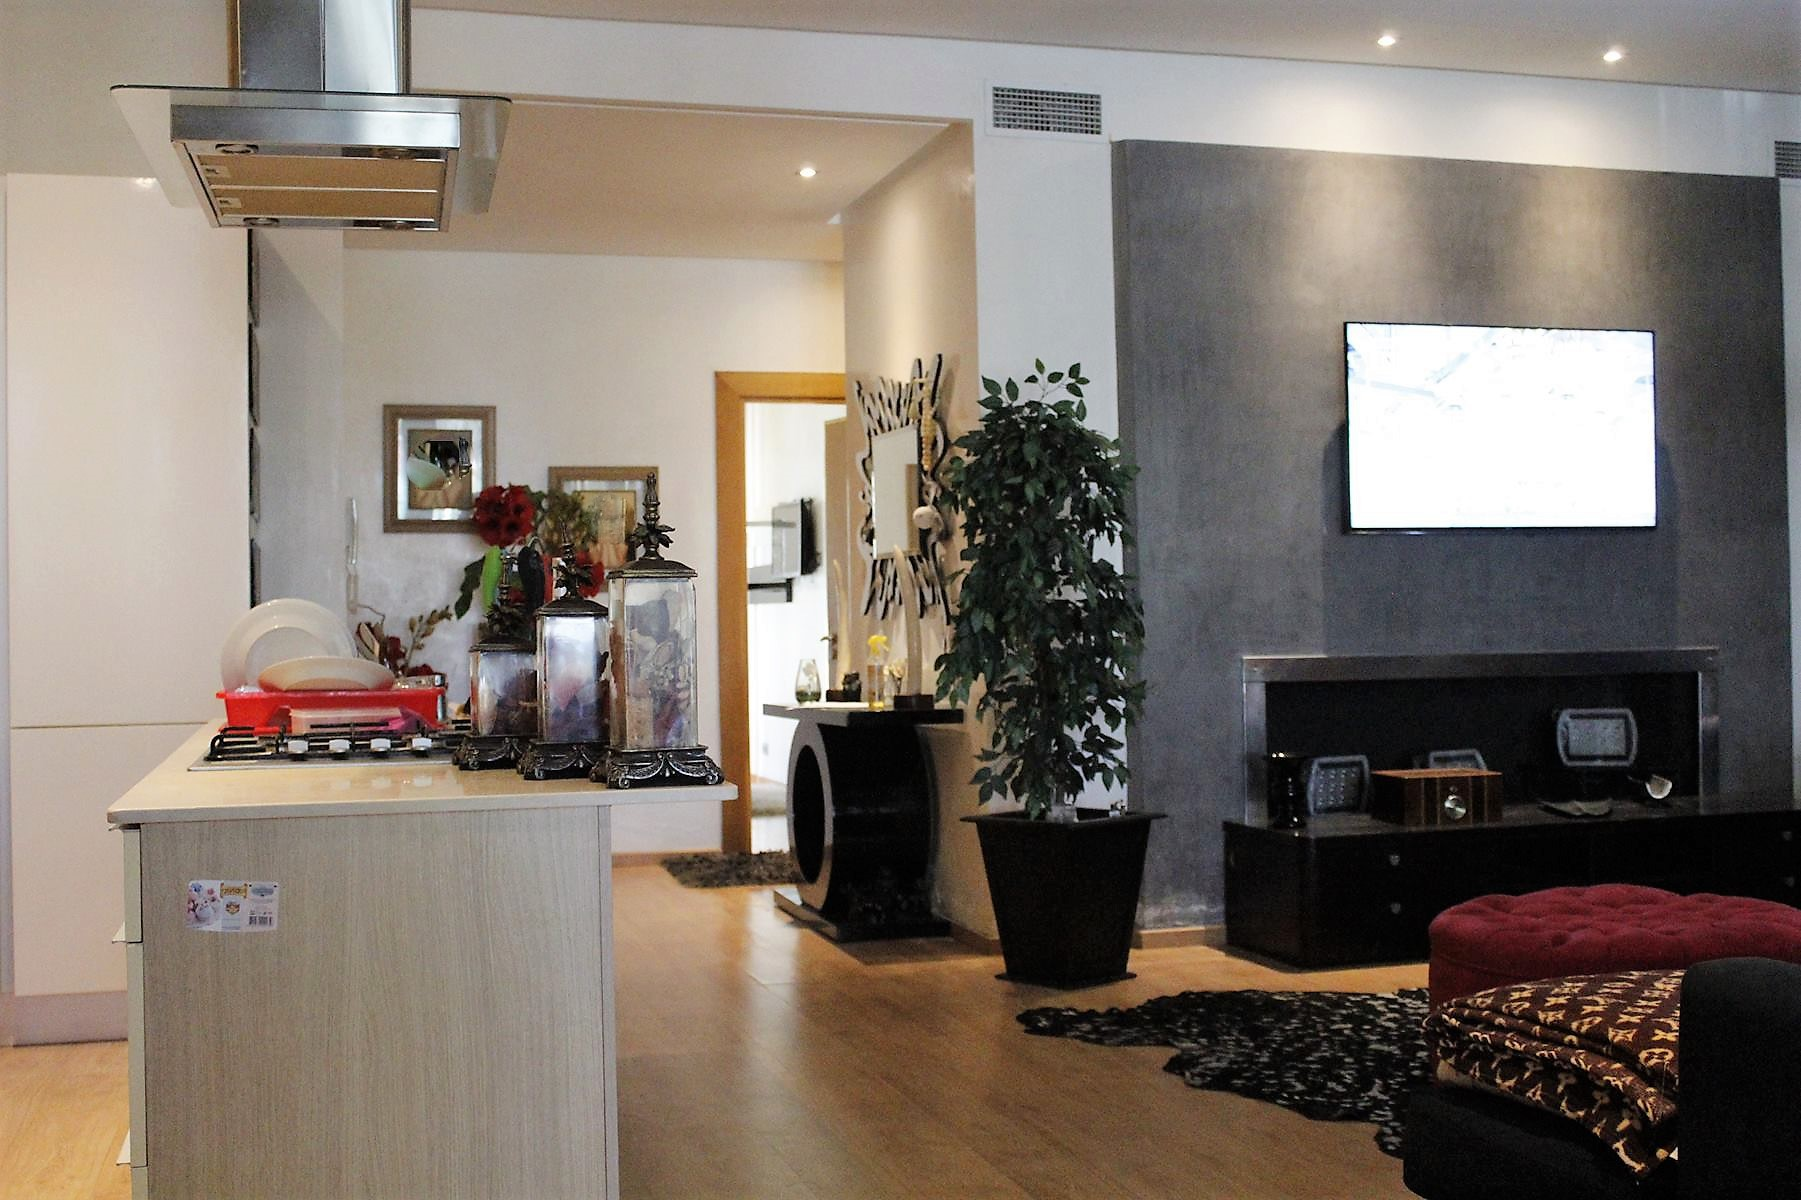 A Louer Dar bouazza, superbe appartement meublé, presque une villa.